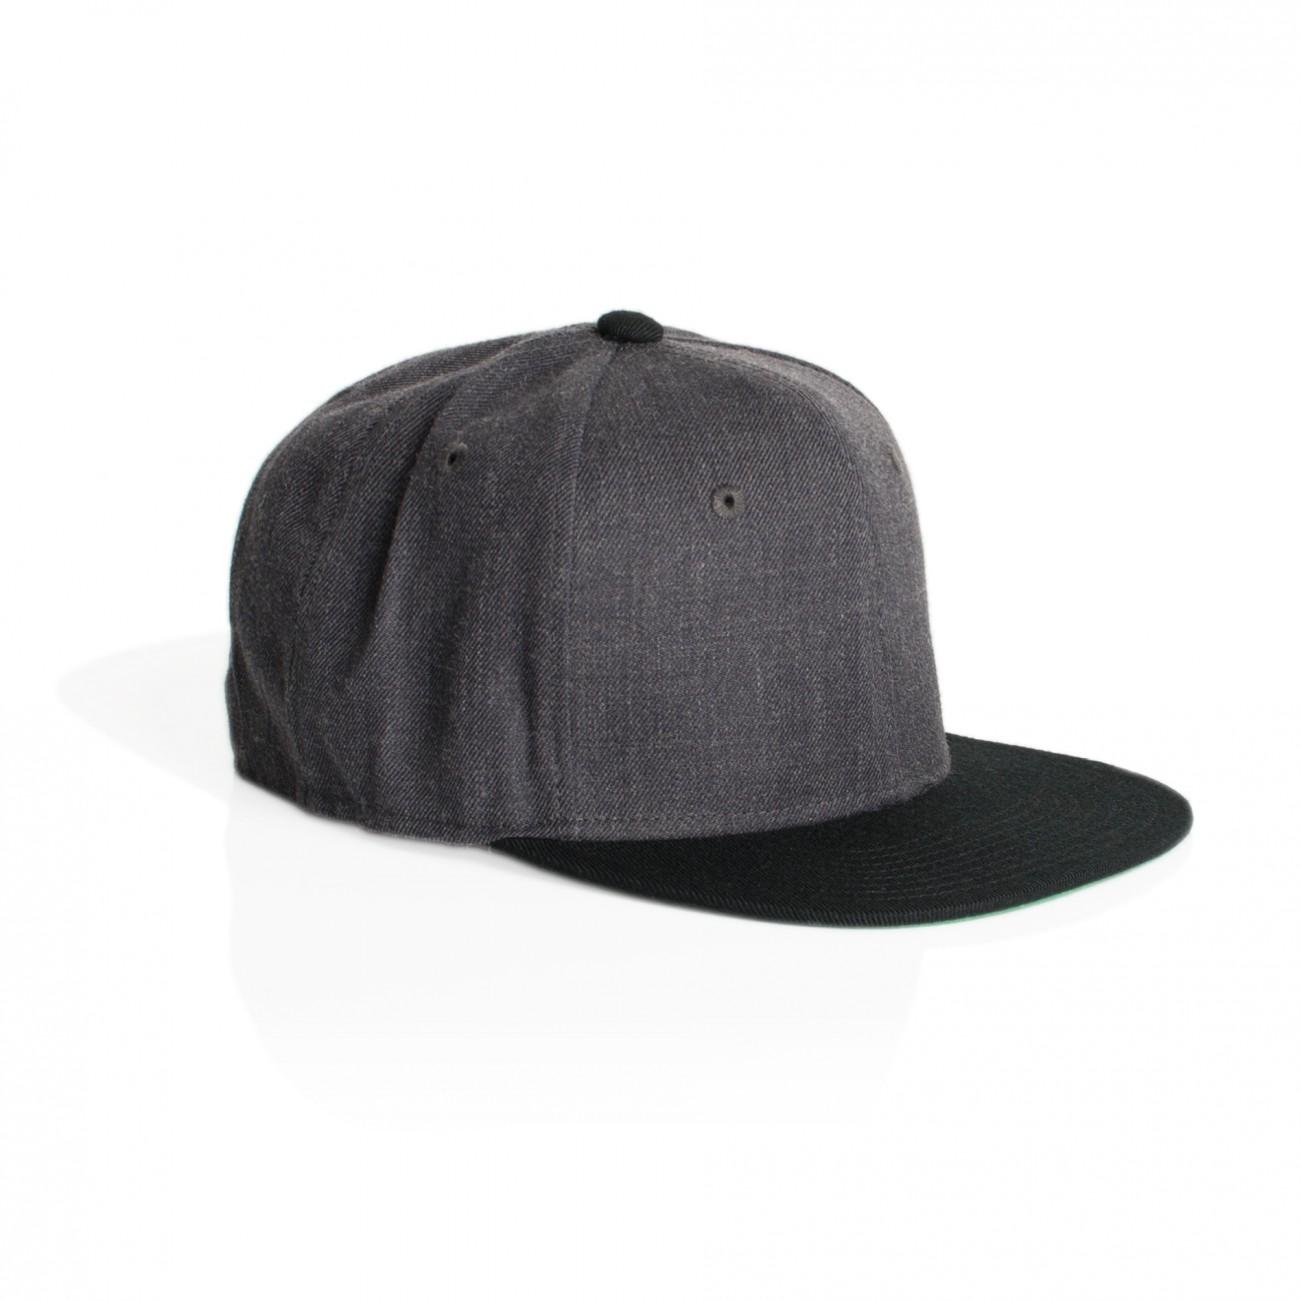 1102_clip_snapback_cap_dark_grey_black_1_1.jpg